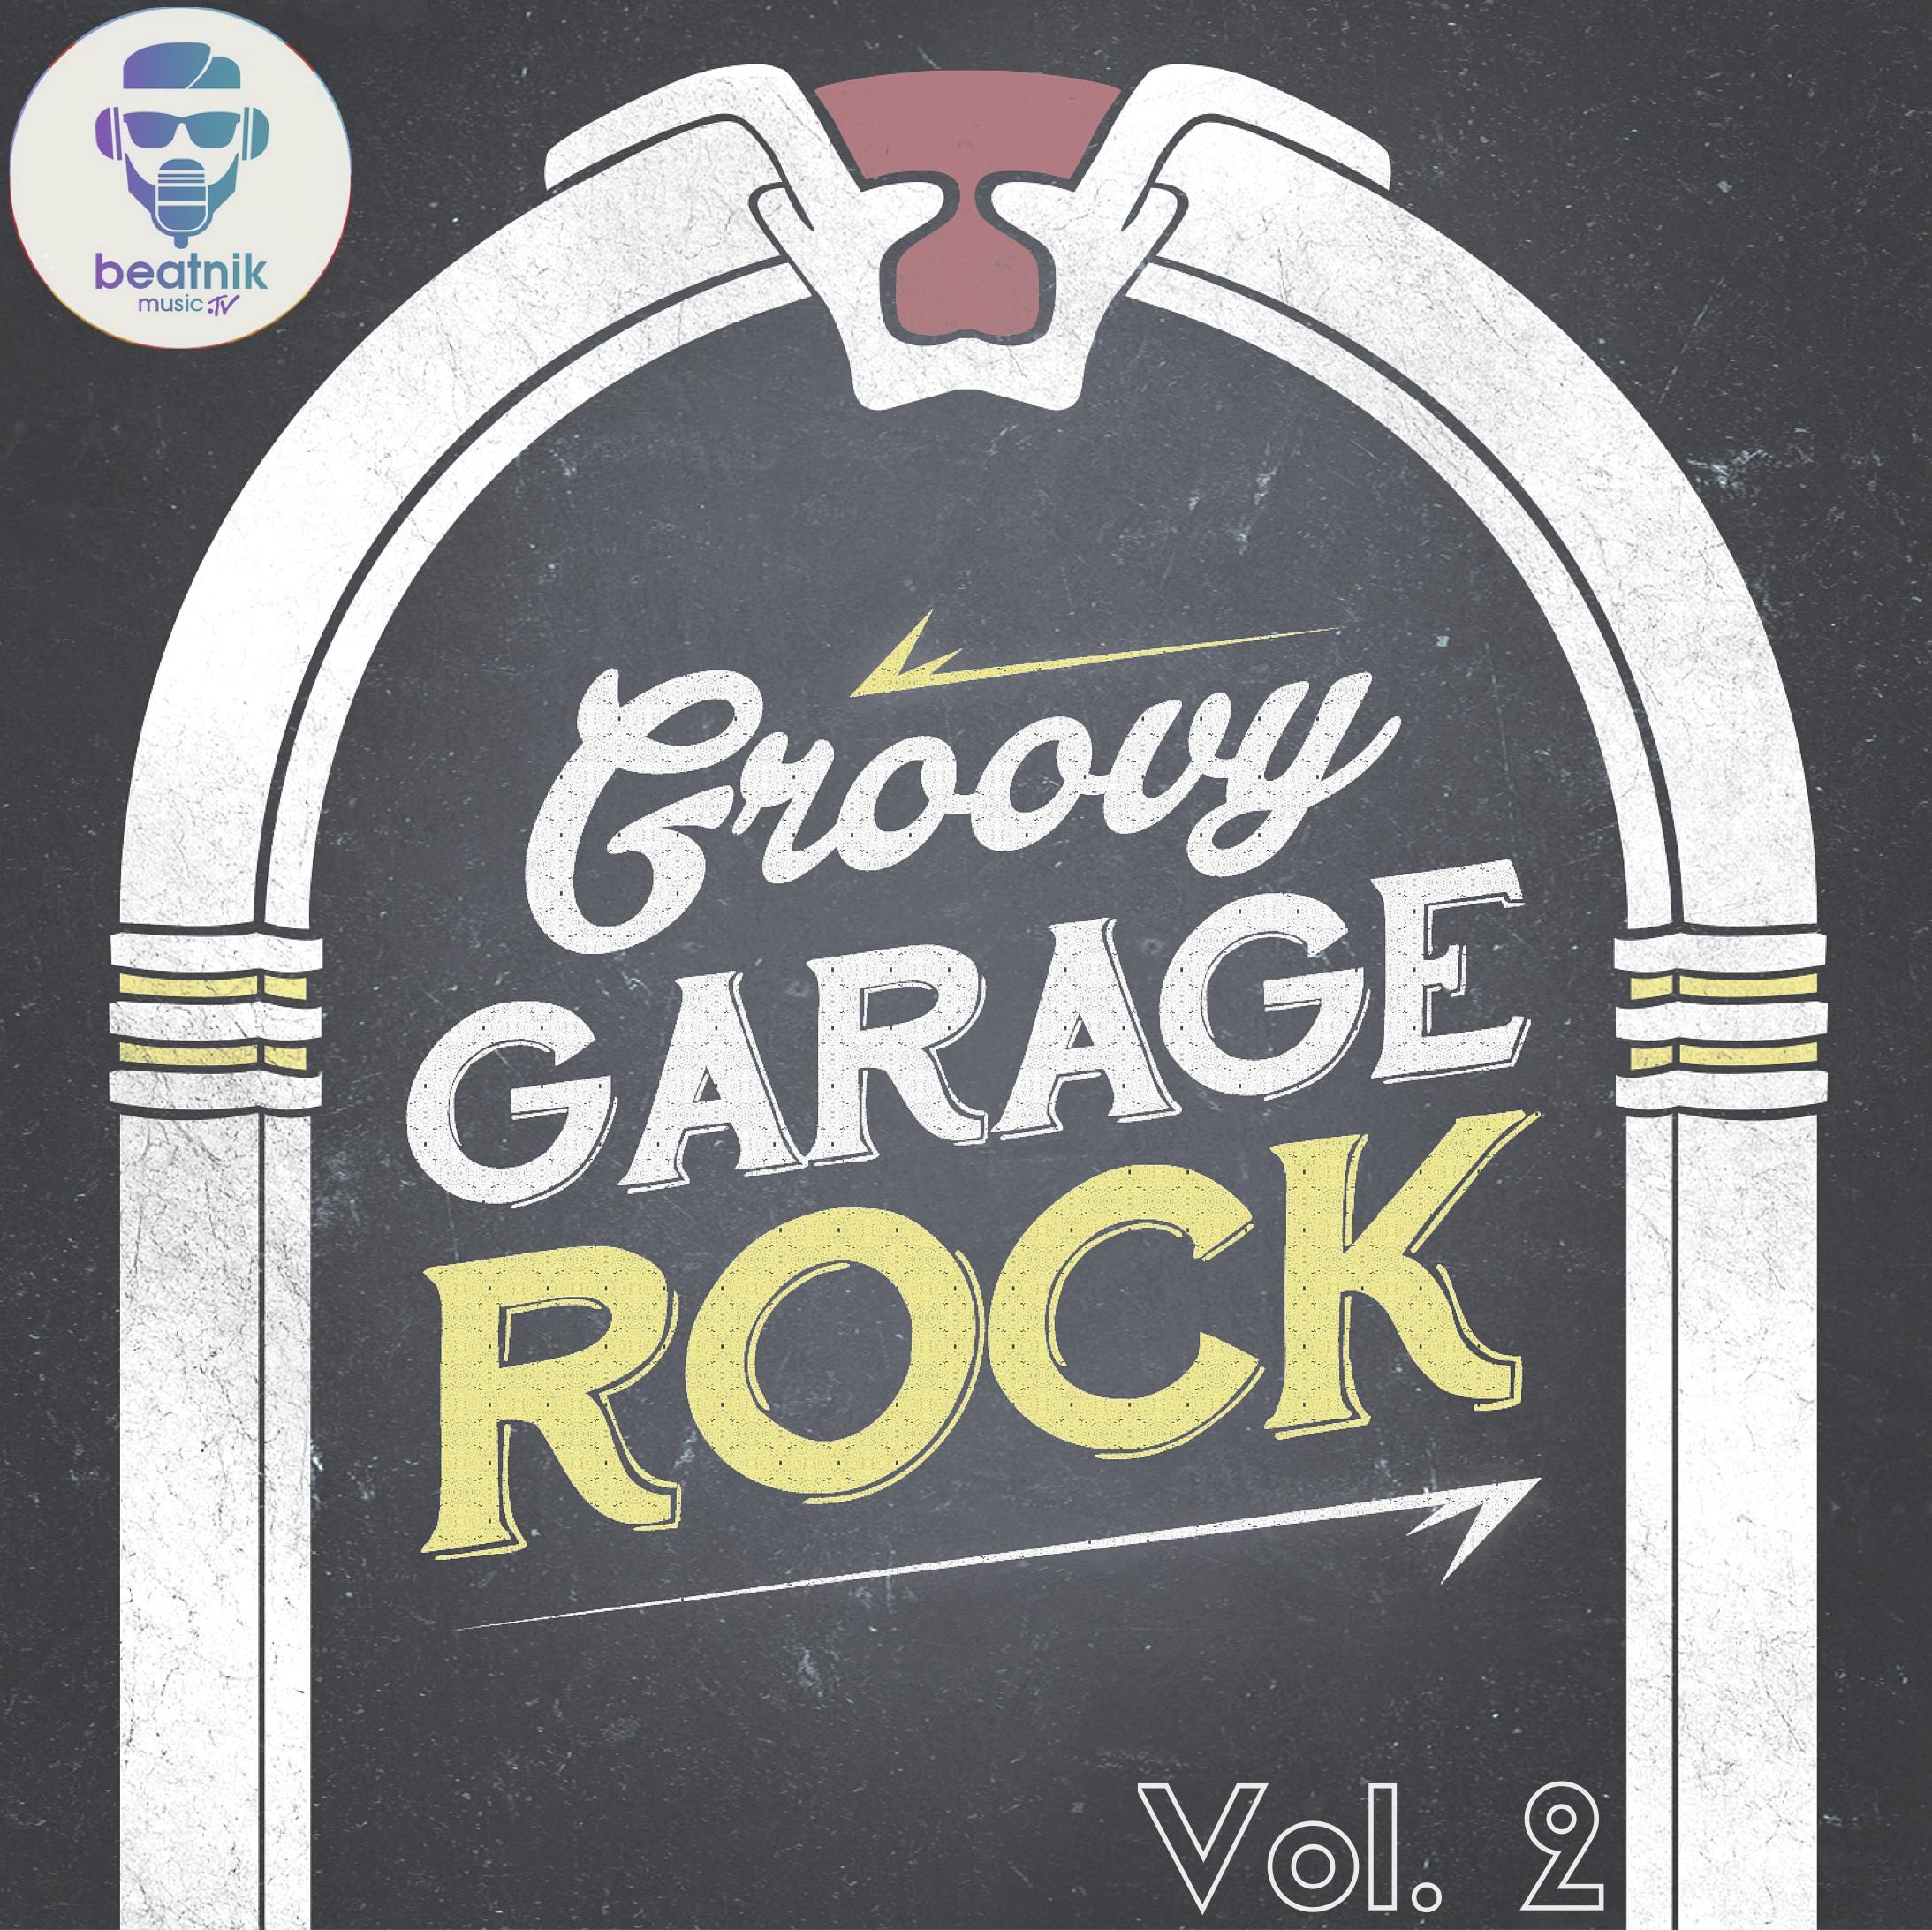 Groovy Garage Rock - Vol. 2_cover.jpg